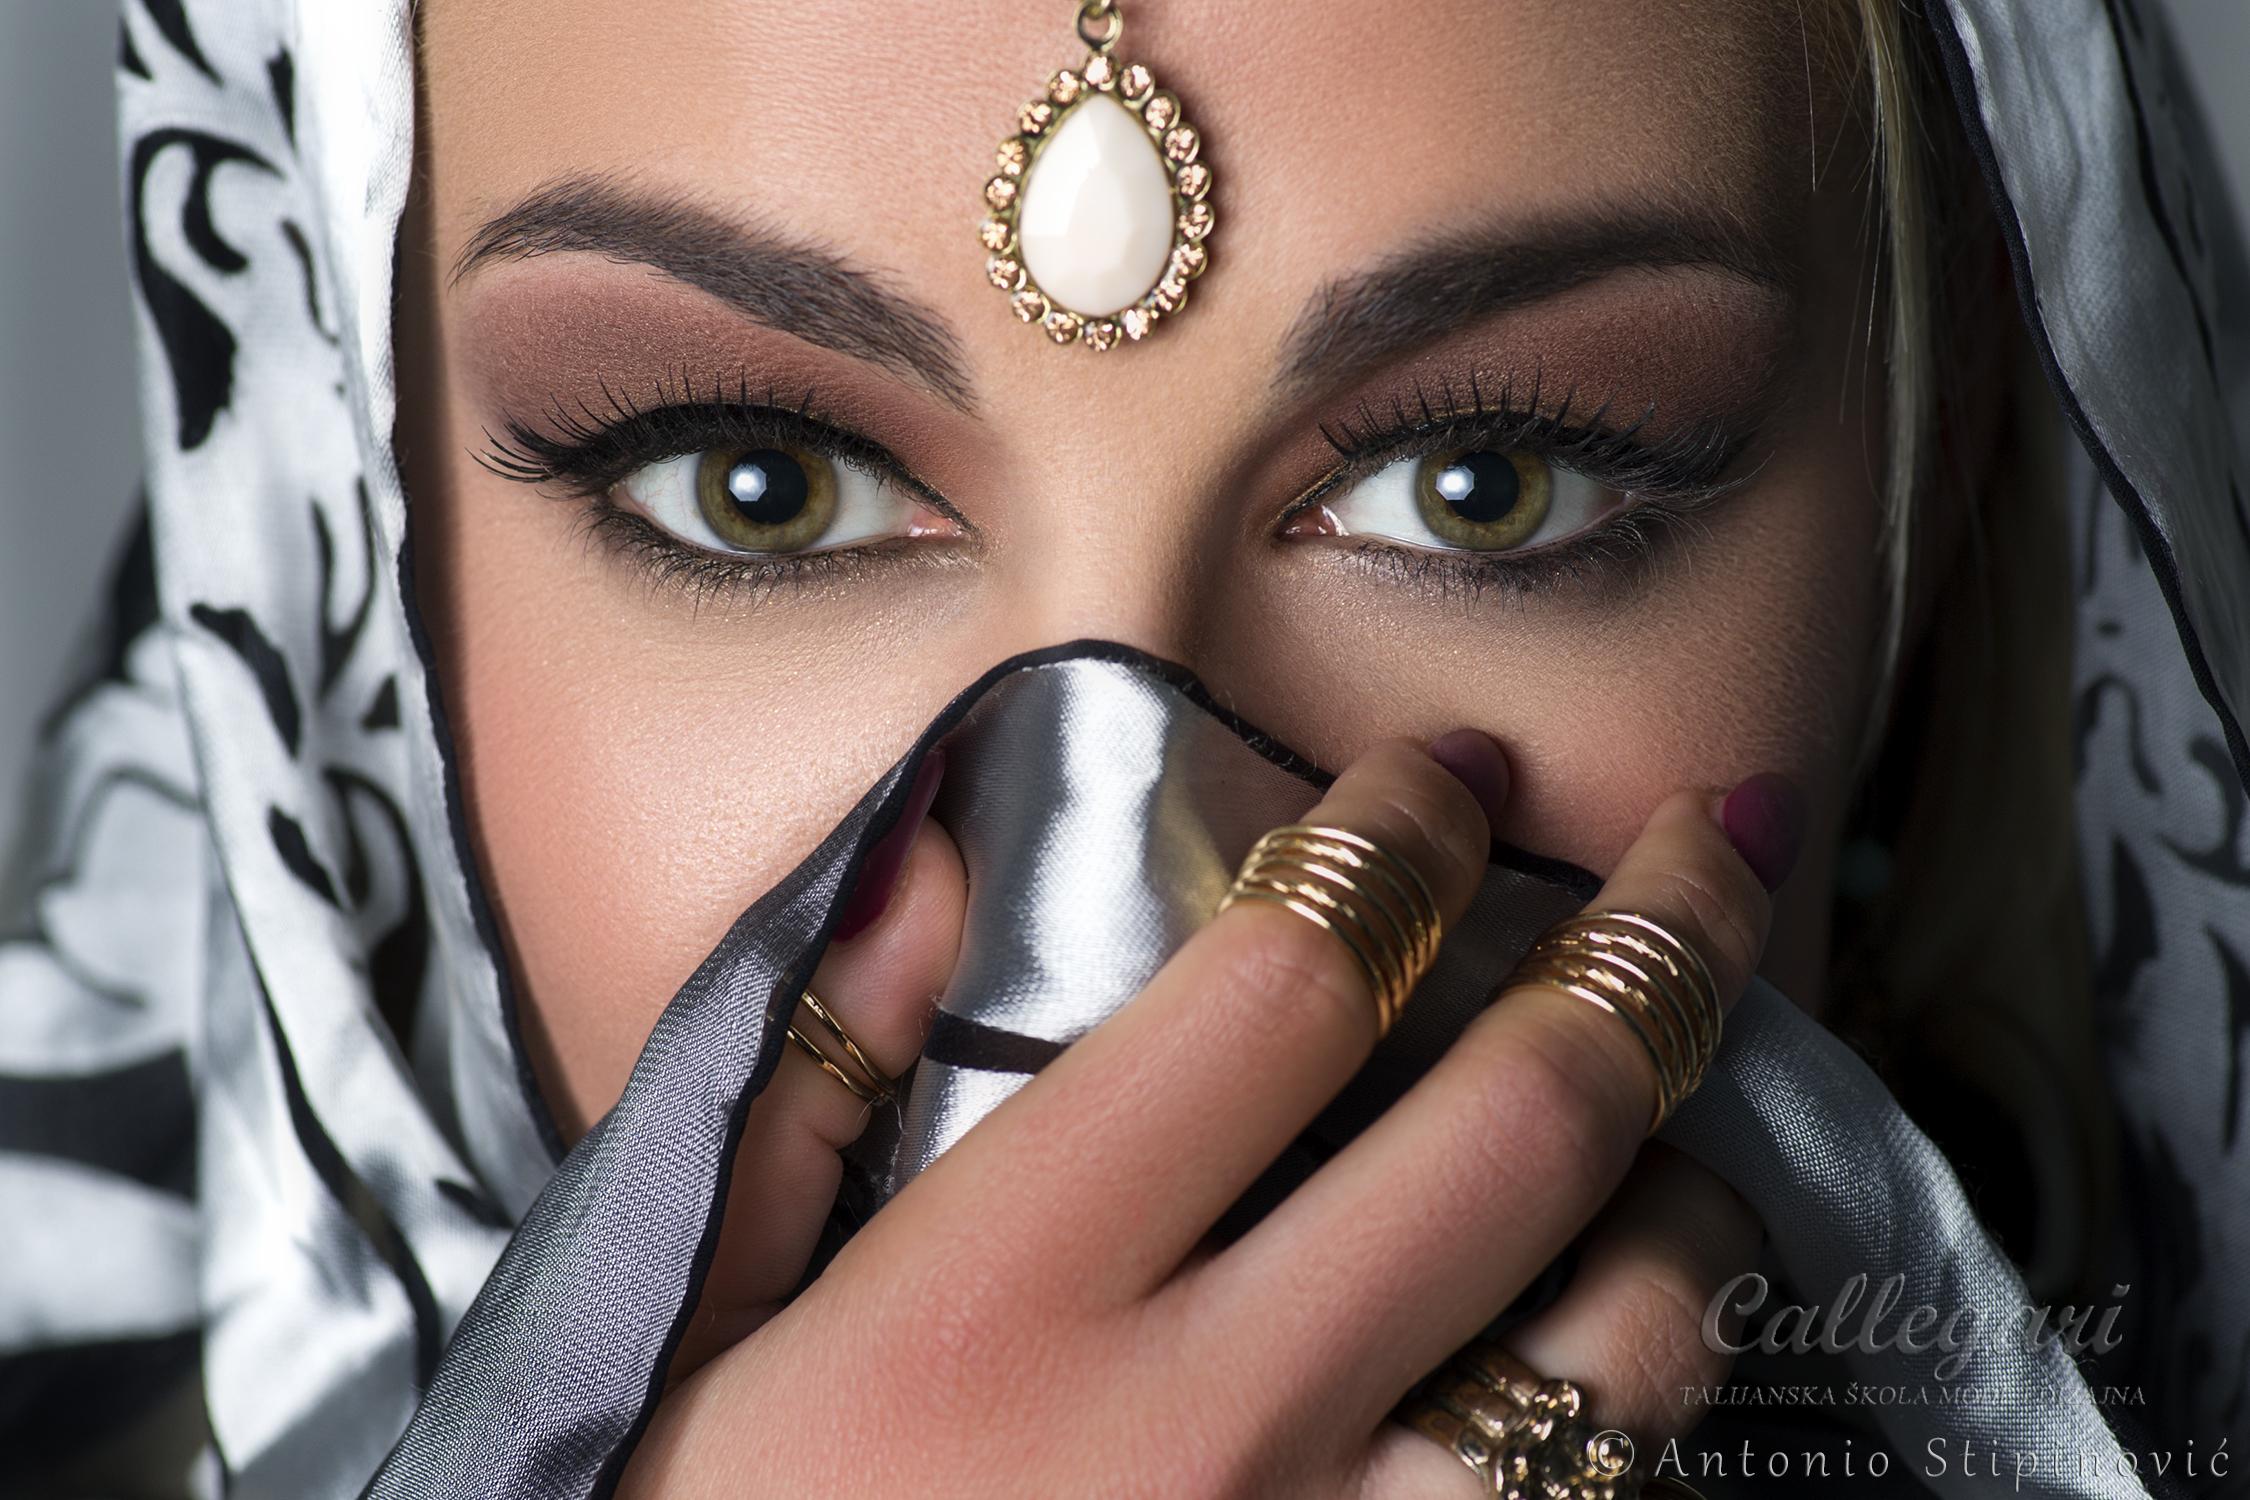 2. stupanj tečaja šminkanja